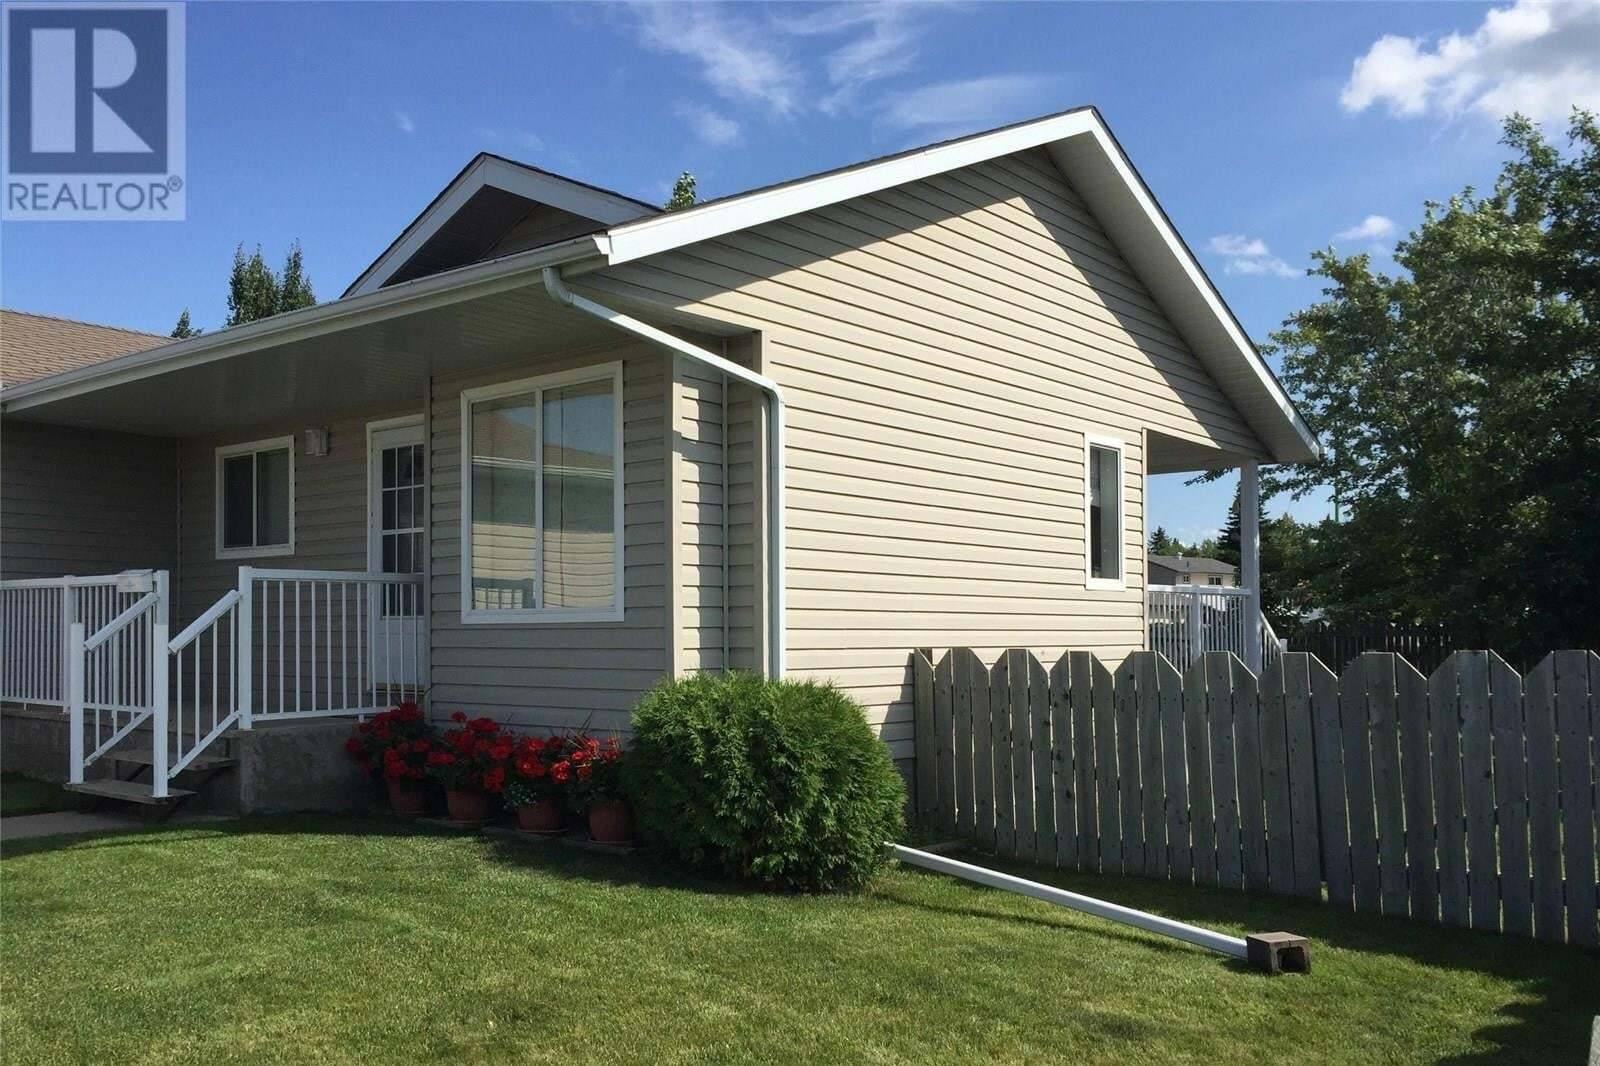 House for sale at 1 Heritage Ct Prince Albert Saskatchewan - MLS: SK826692